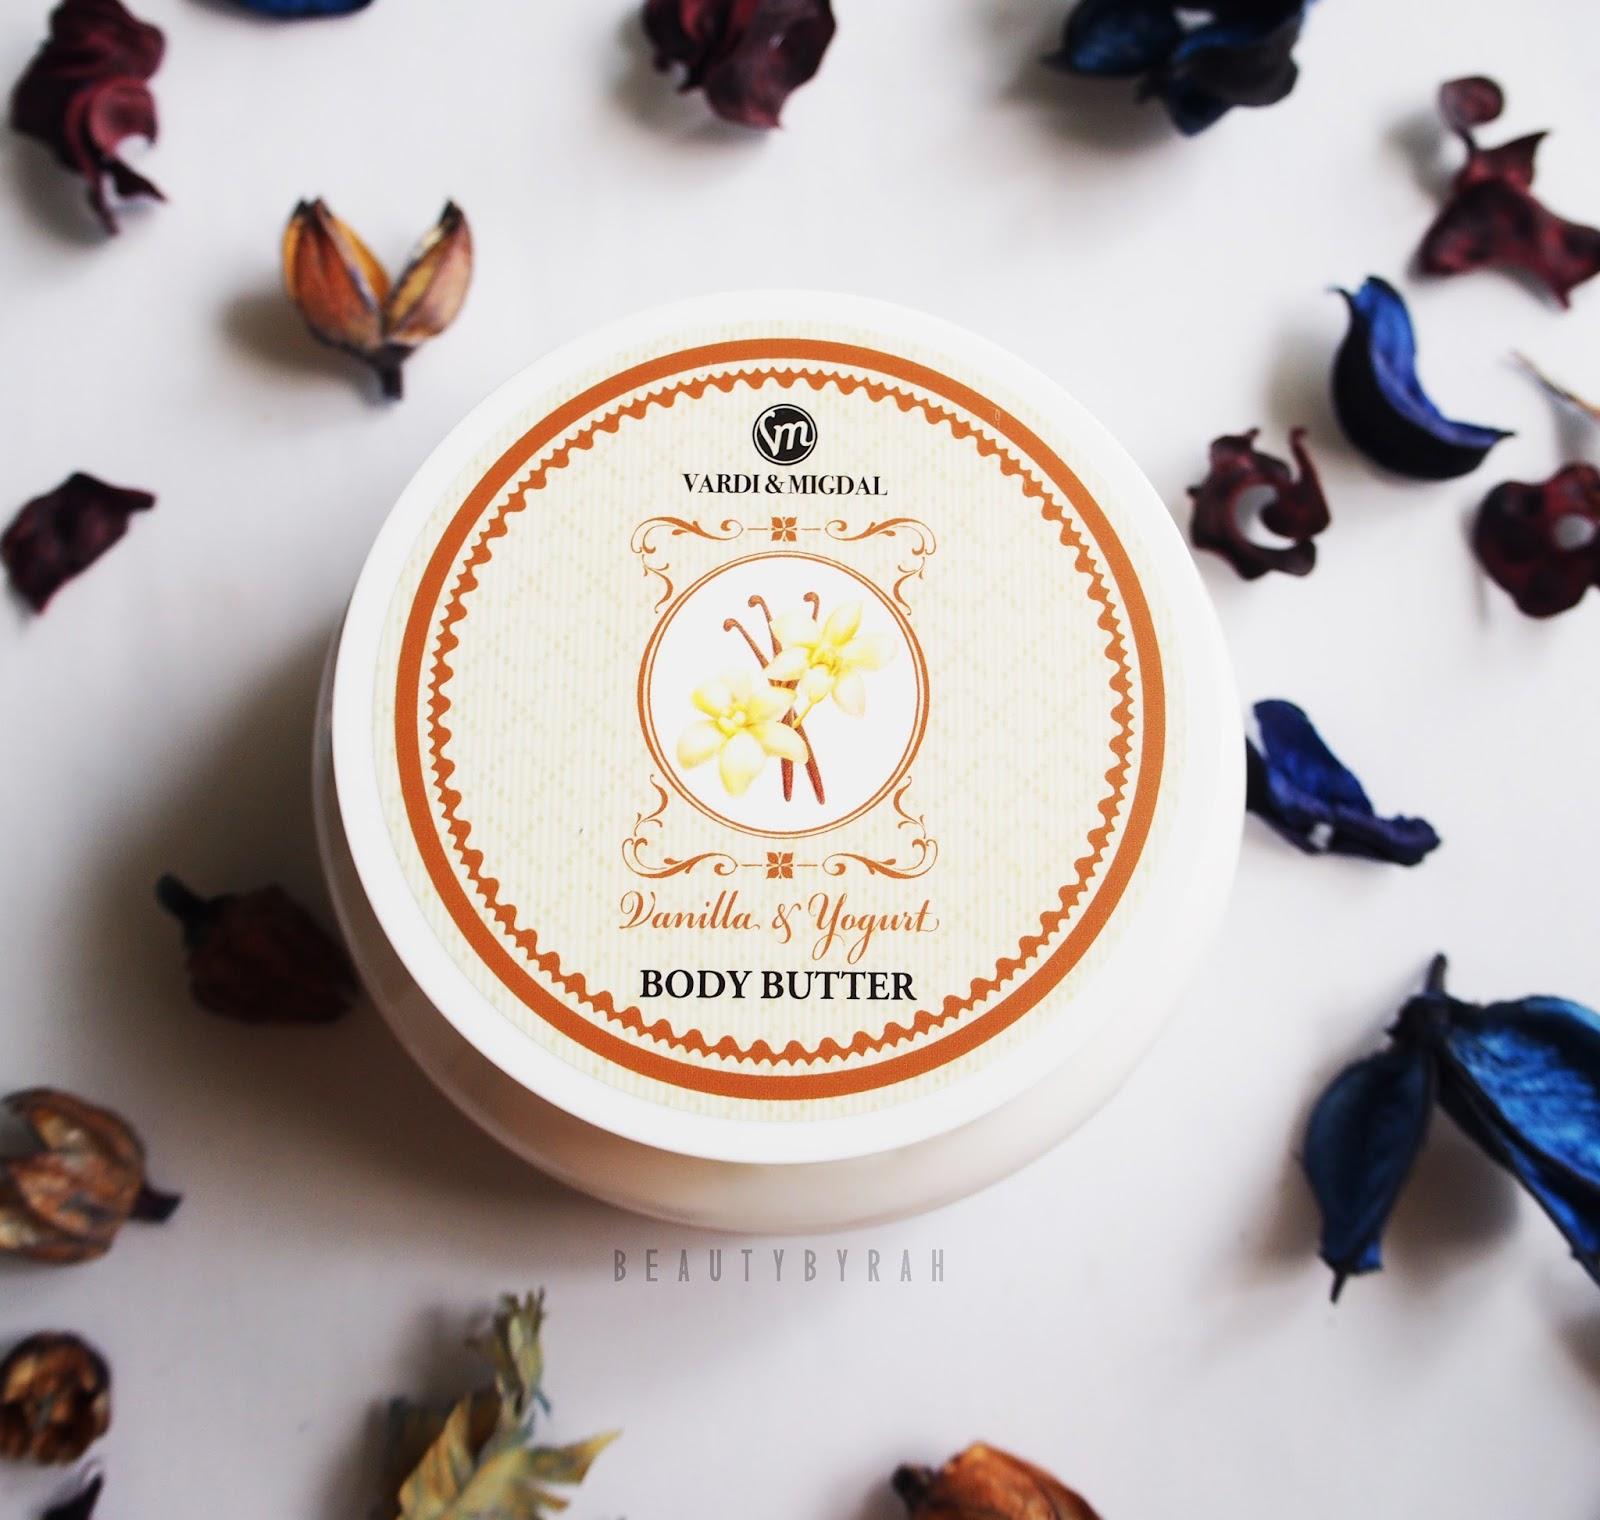 Vardi & Midgal Body Care Vanilla and Yoghurt Body Butter Review